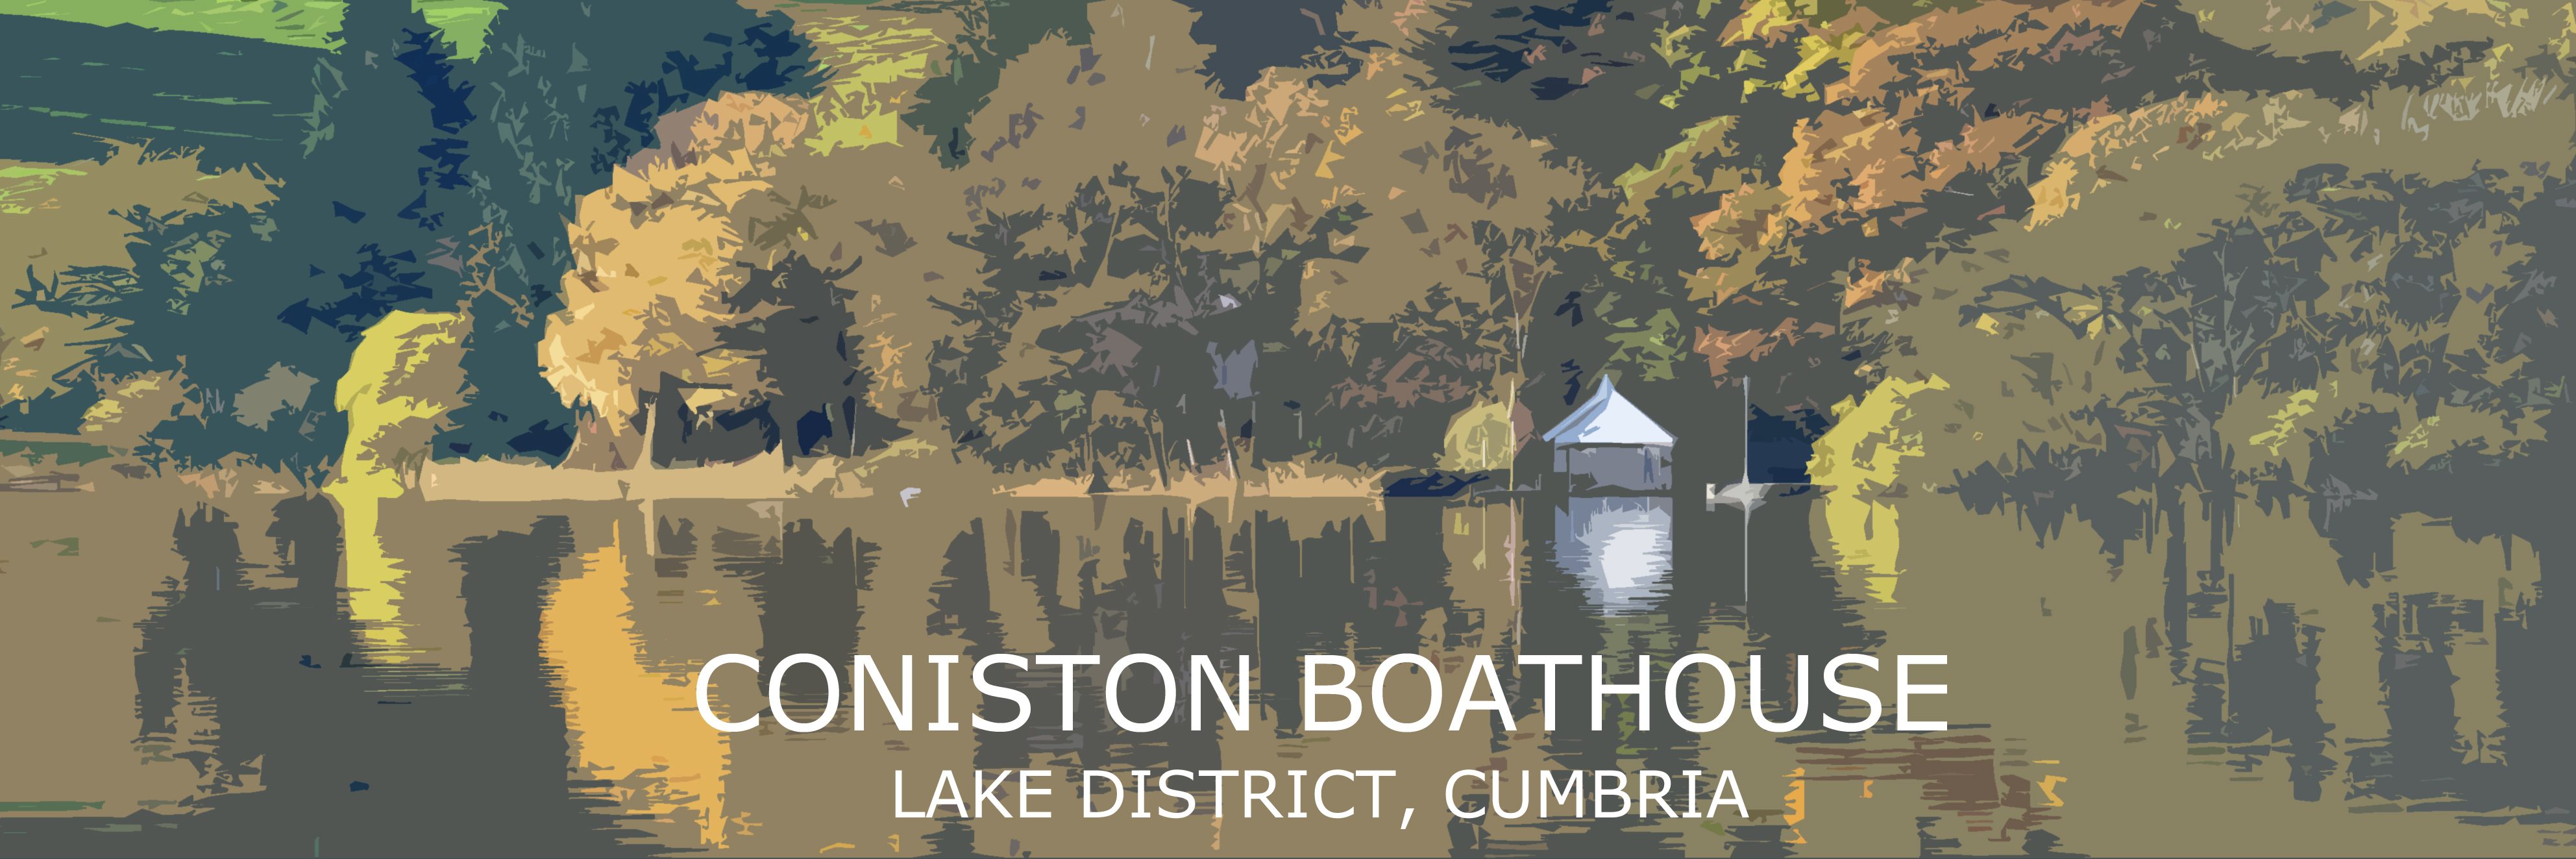 Coniston Boathouse